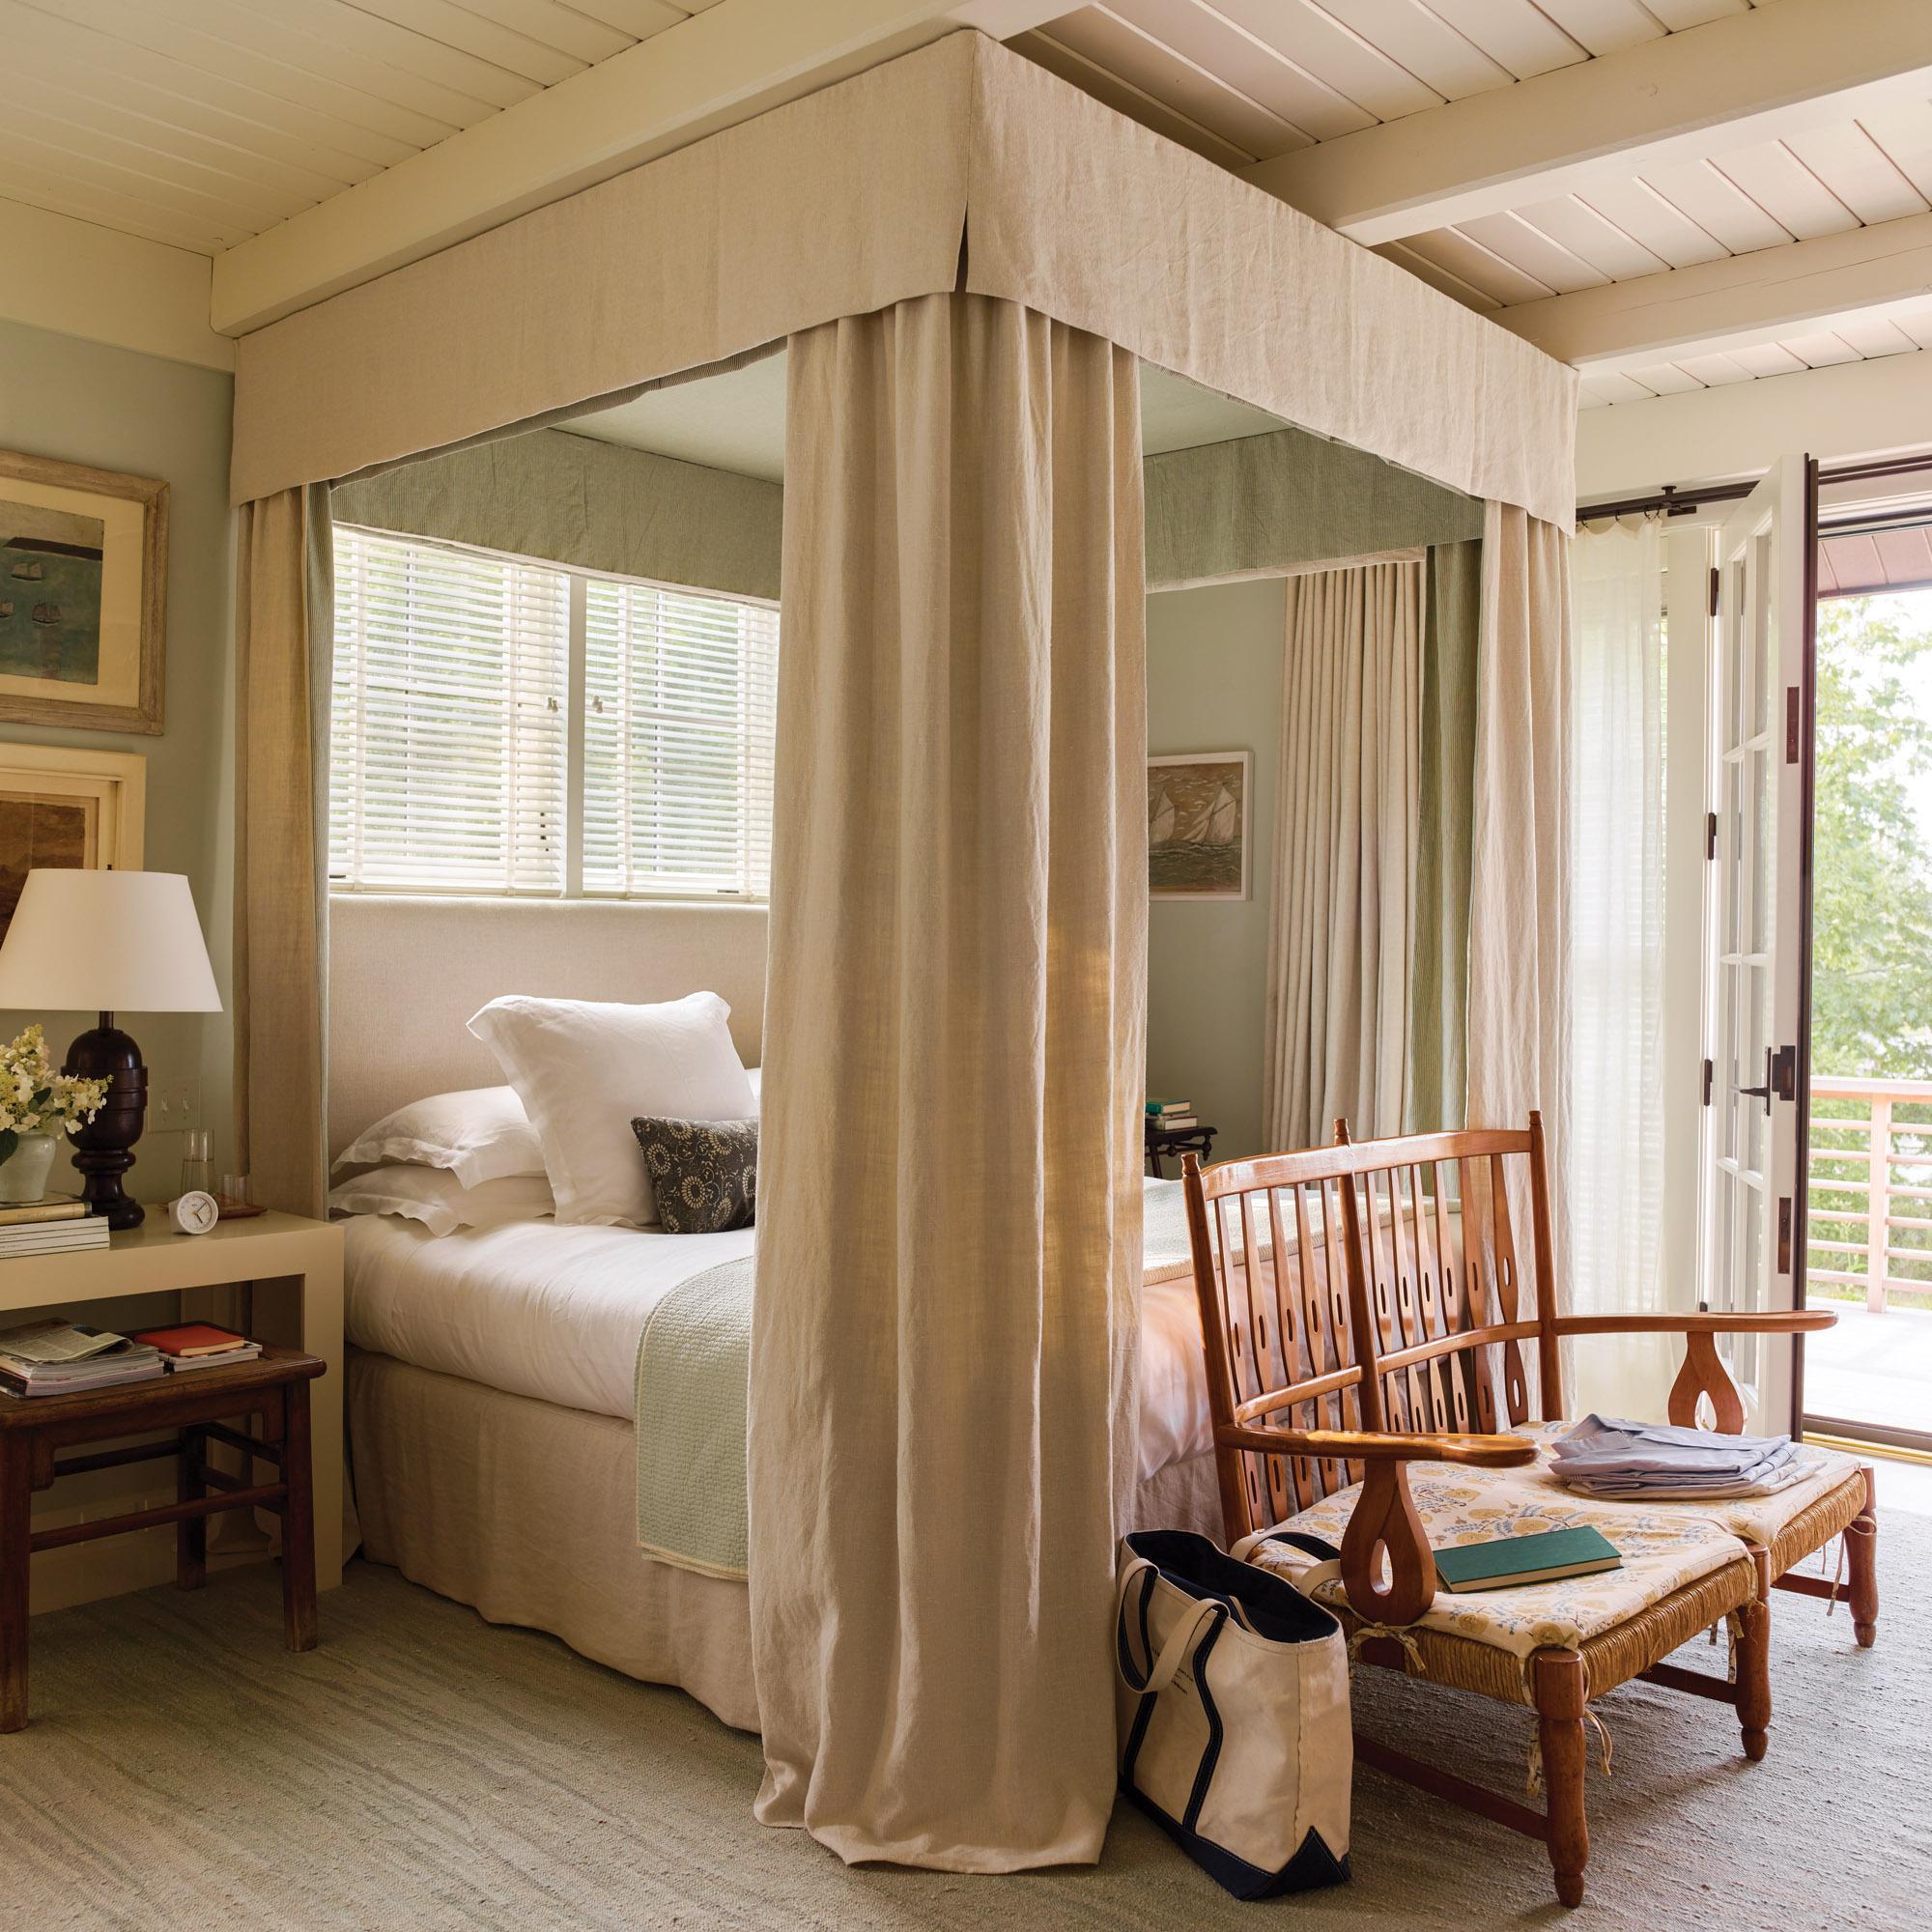 bed designed by Gil Schafer